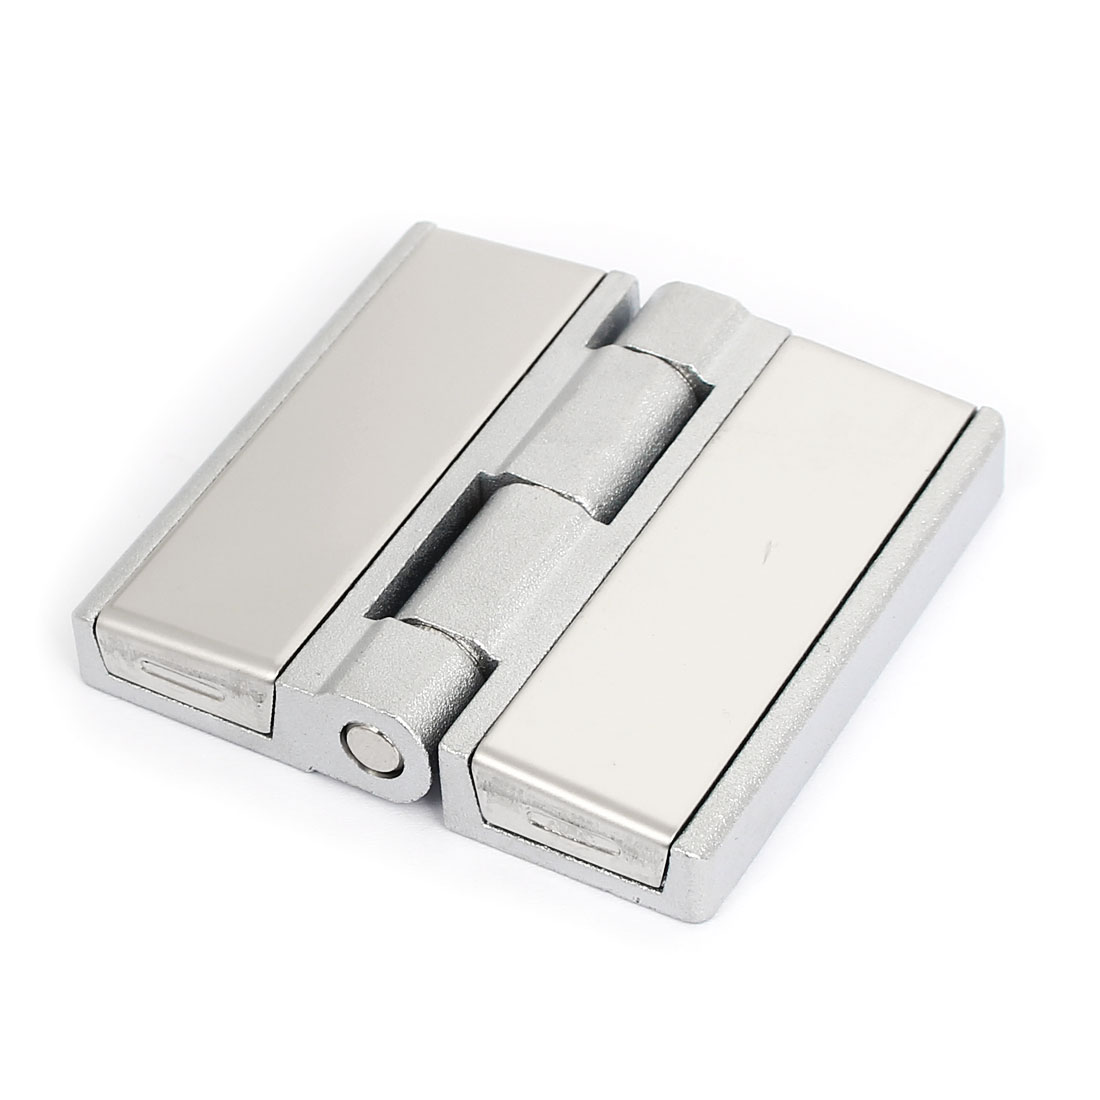 Cabinet Closet Tool Box Rotatable Metal Door Butt Hinge Silver Tone